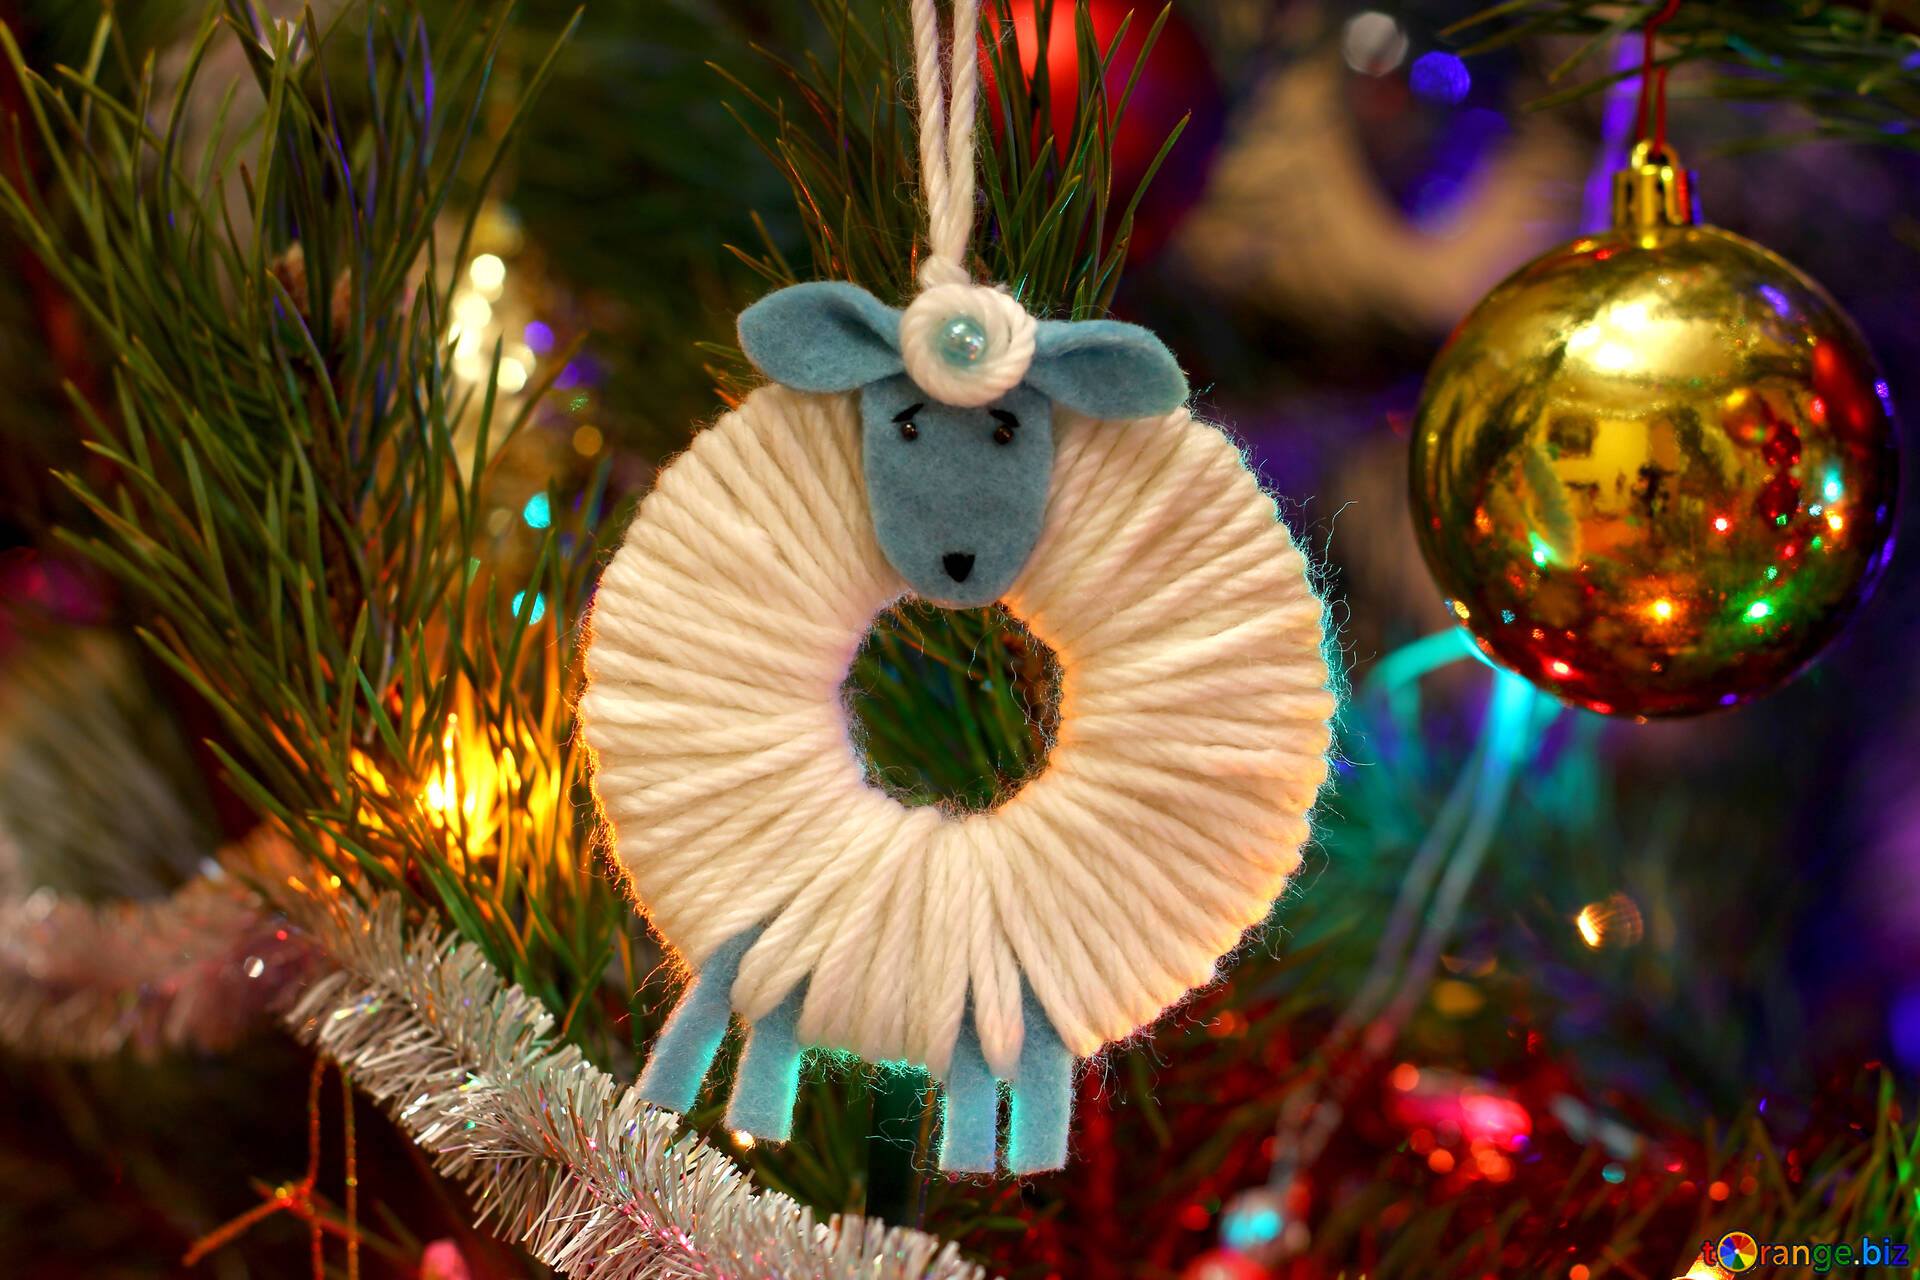 Christmas Tree Toys Handmade.Toy Sheep Handmade Christmas Tree Decorations Sheep Toy 37176